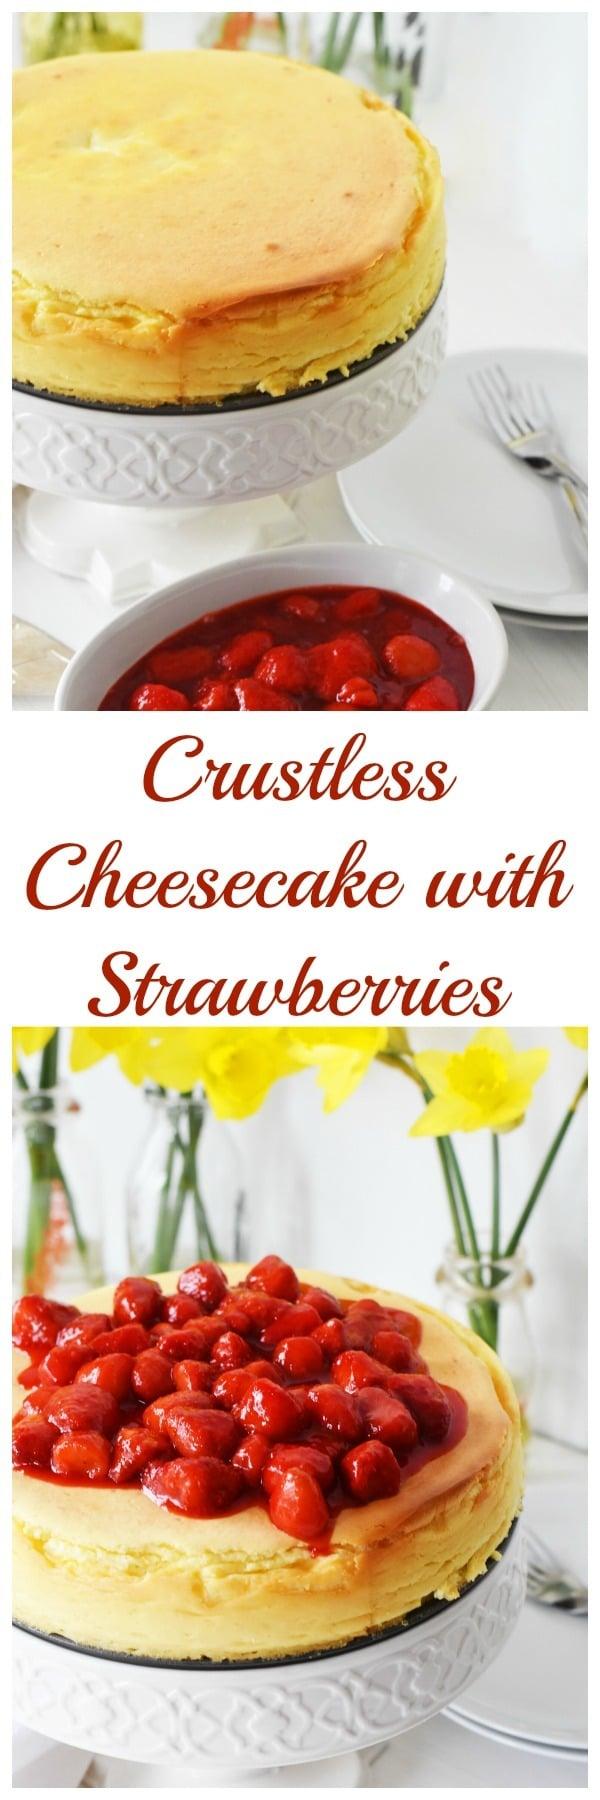 Crustless Cheesecake with Strawberries